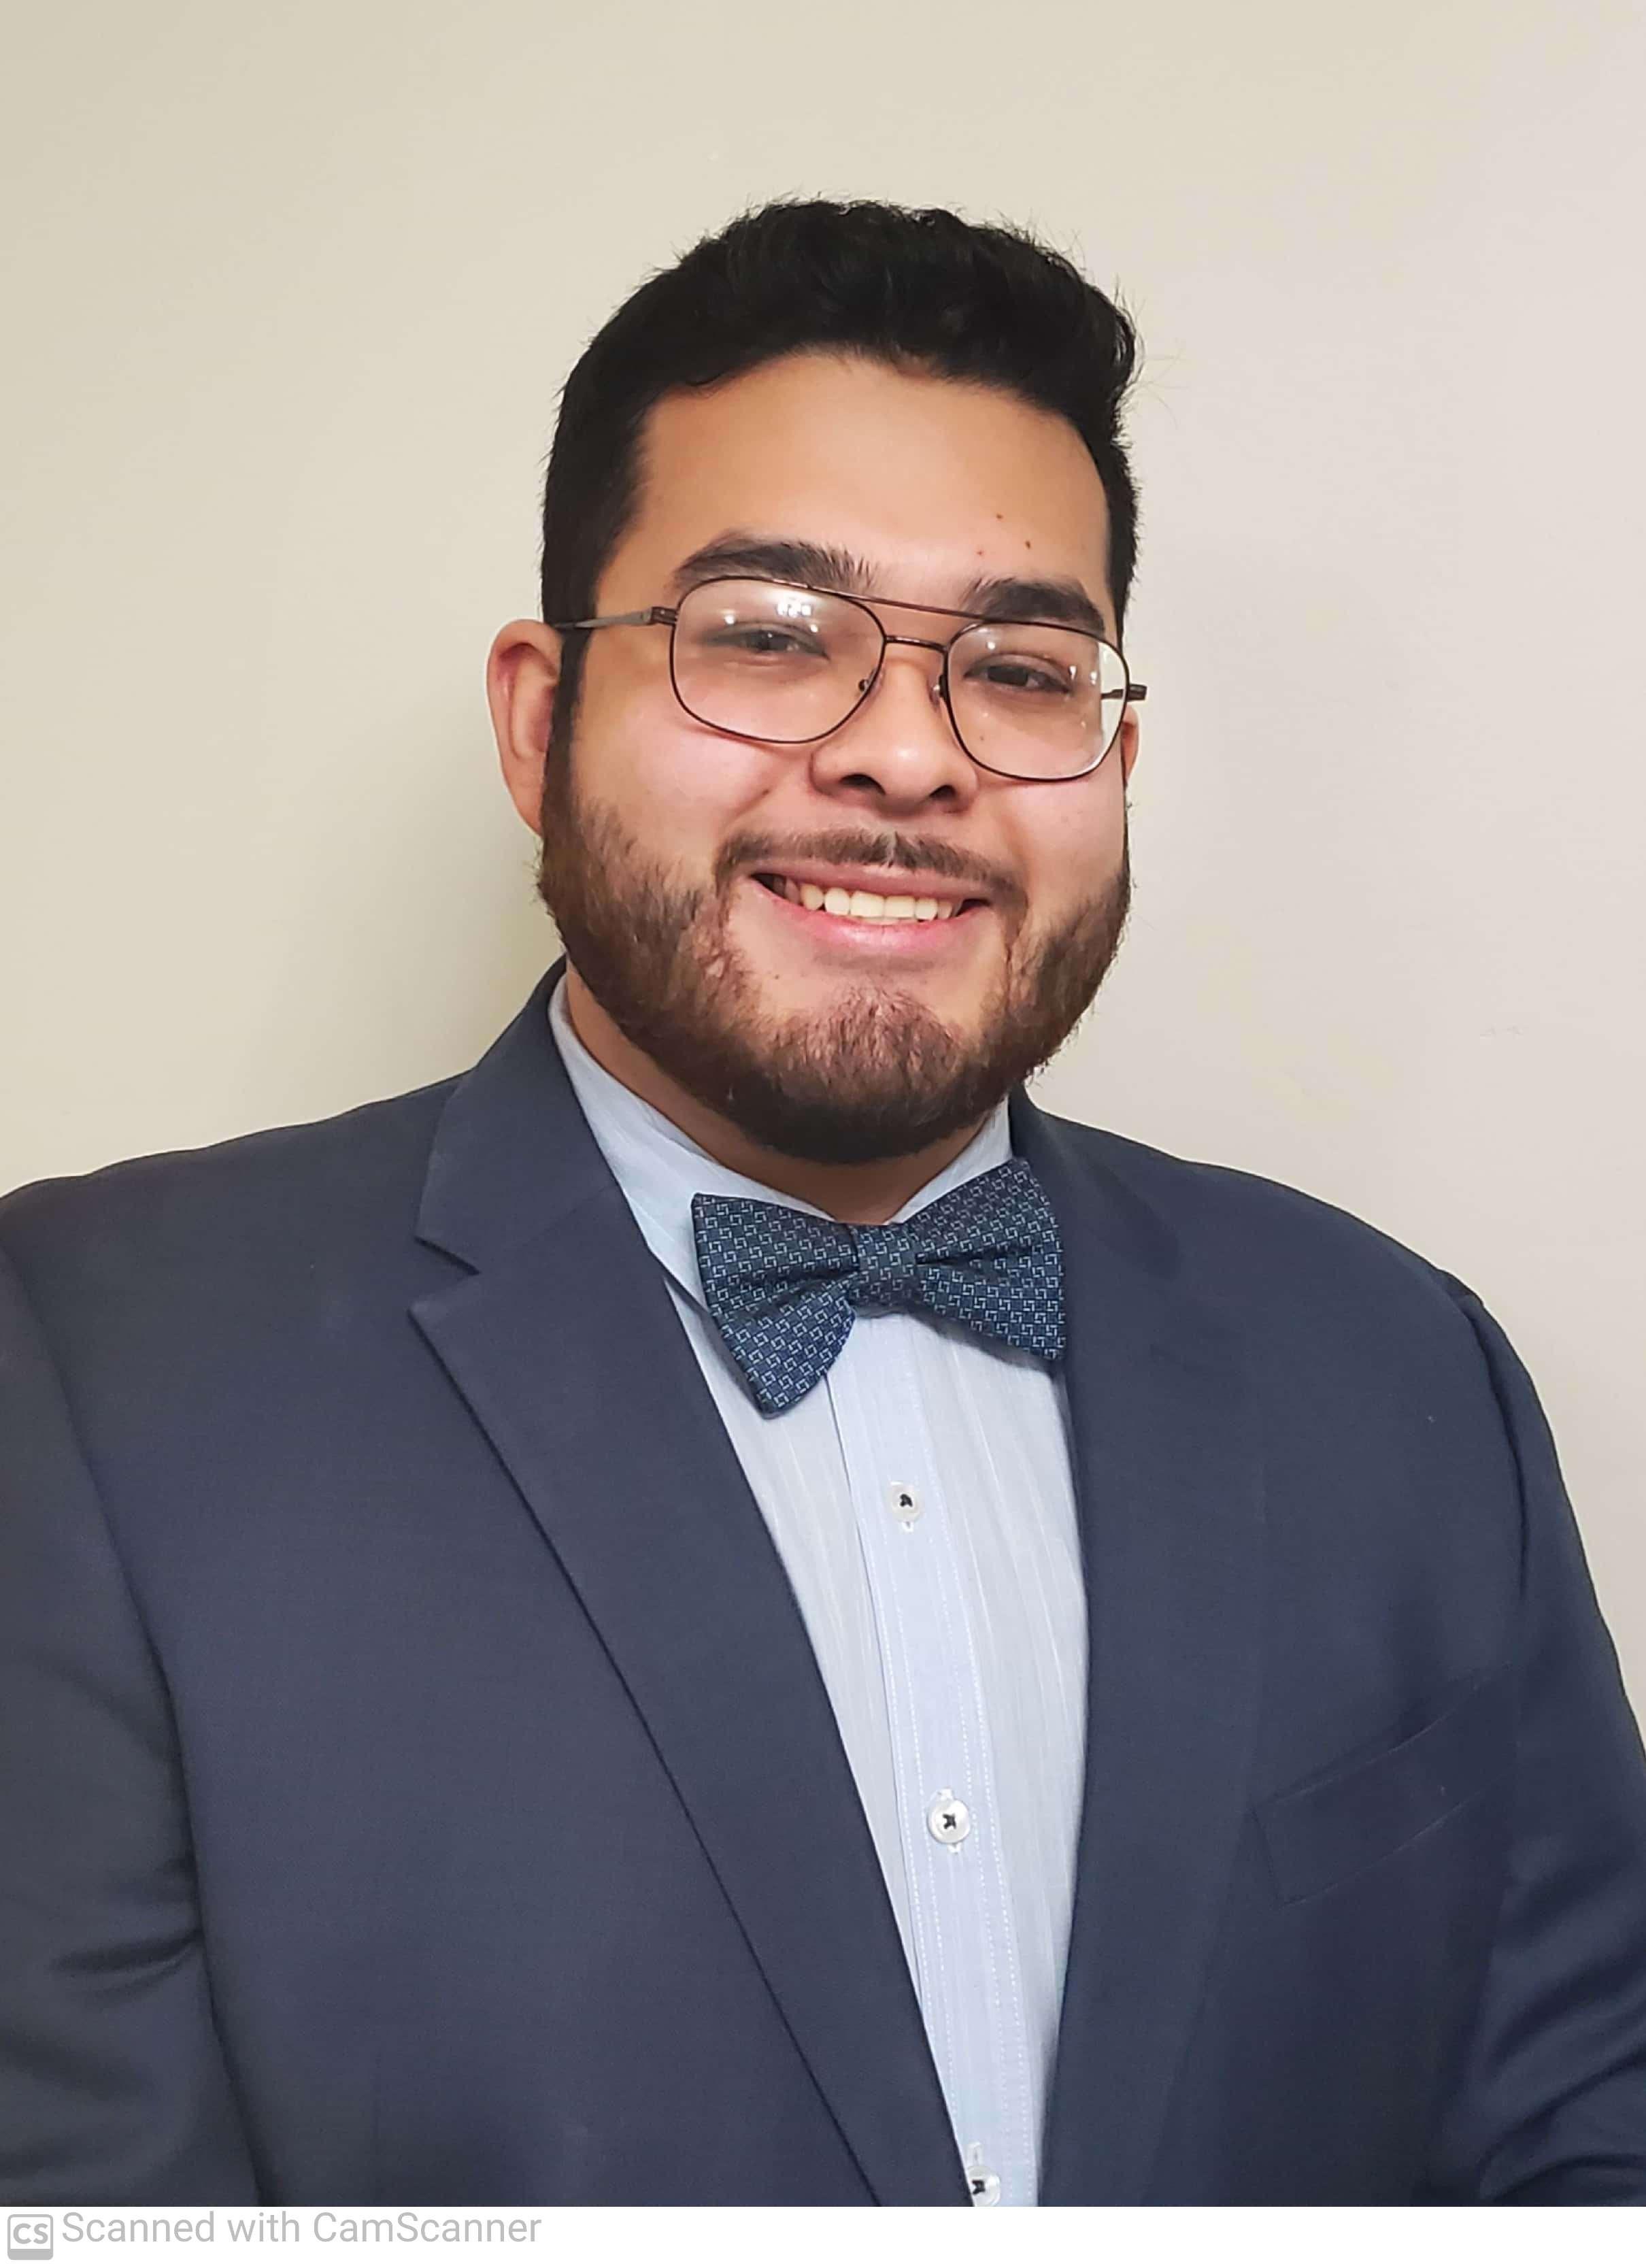 Veriheal Innovation in Cannabis Scholarship 2021 Winner Benjamin Sanchez